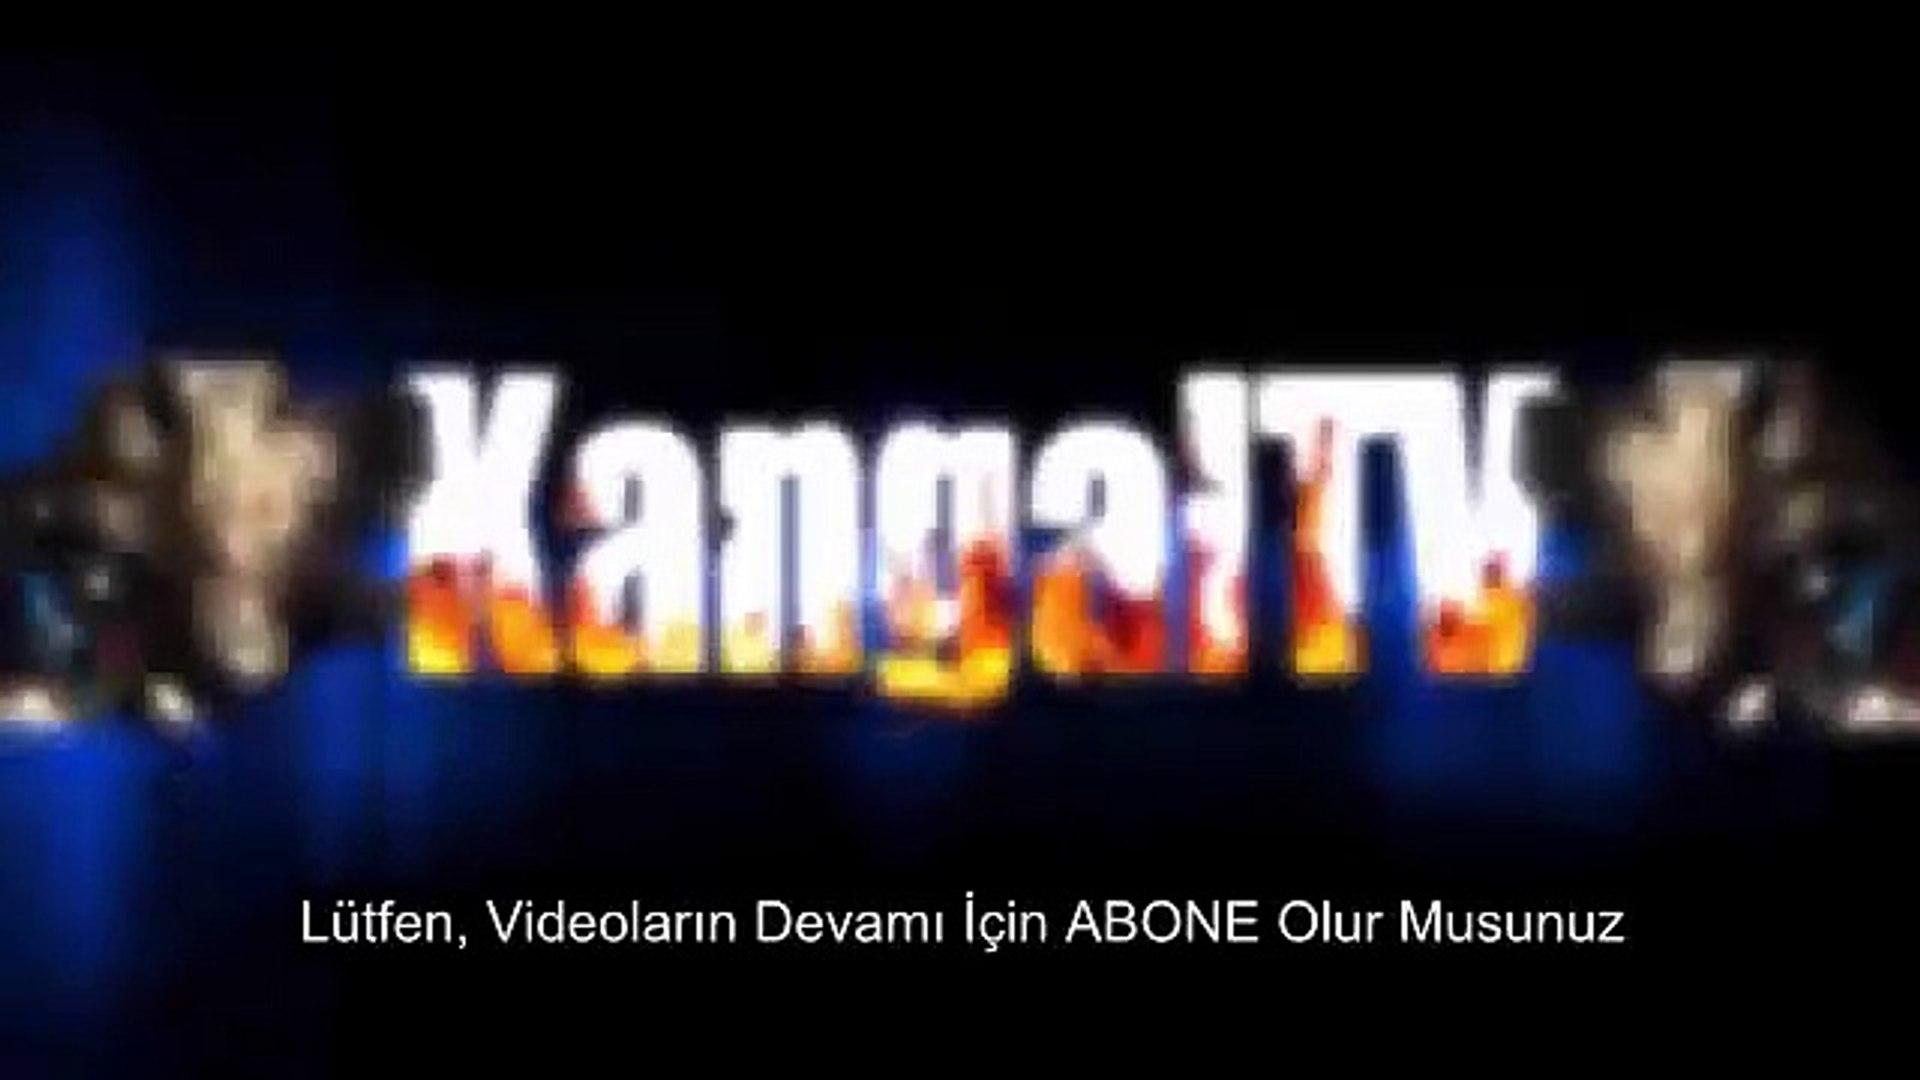 COK SiNiRLi AKBAS COBAN KOPEGi - VERY ANGRY AKBASH SHEPHERD DOG